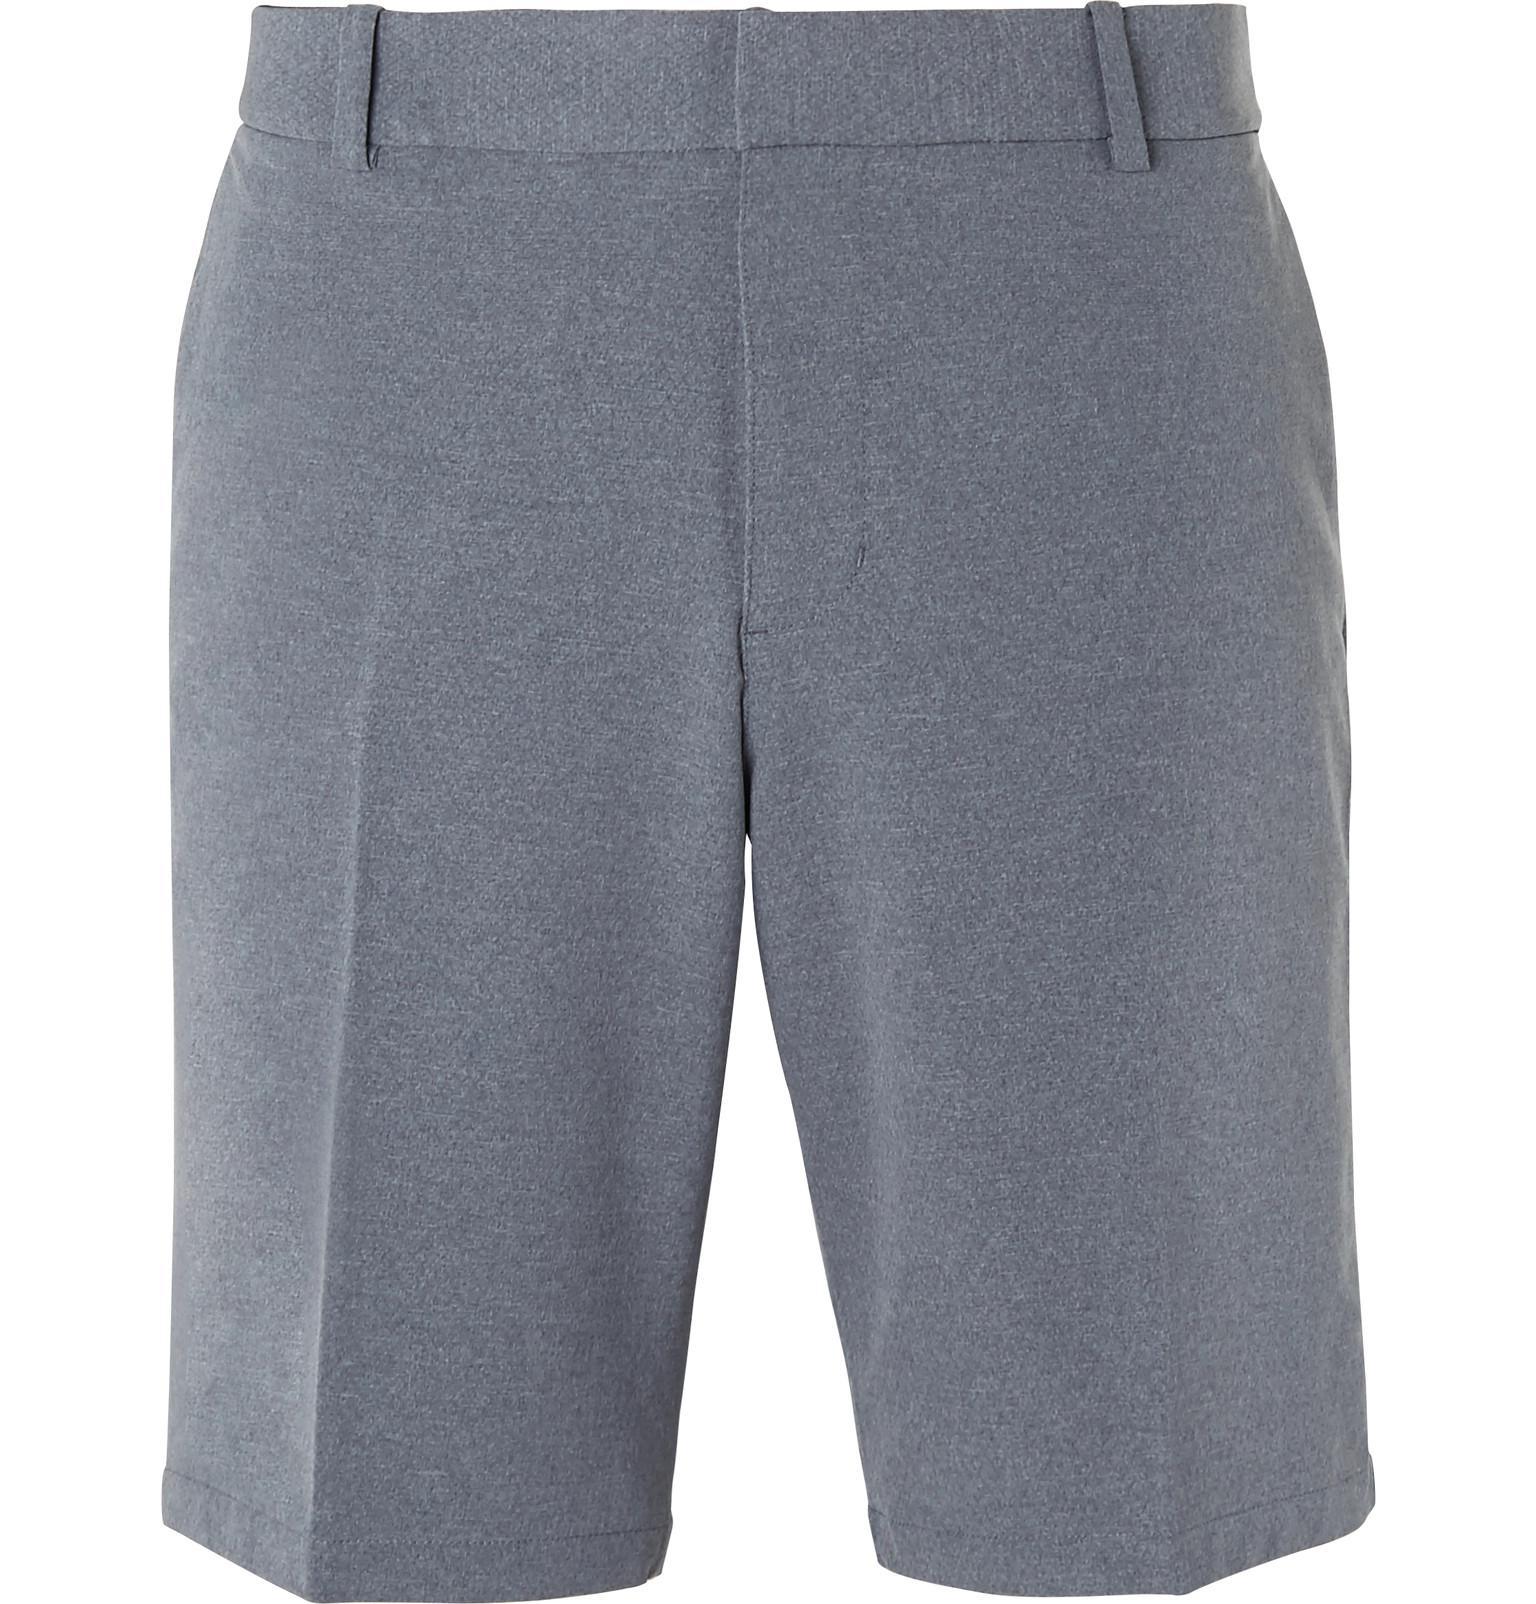 76c77fdb5349 Nike Flex Dri-fit Golf Shorts in Gray for Men - Lyst